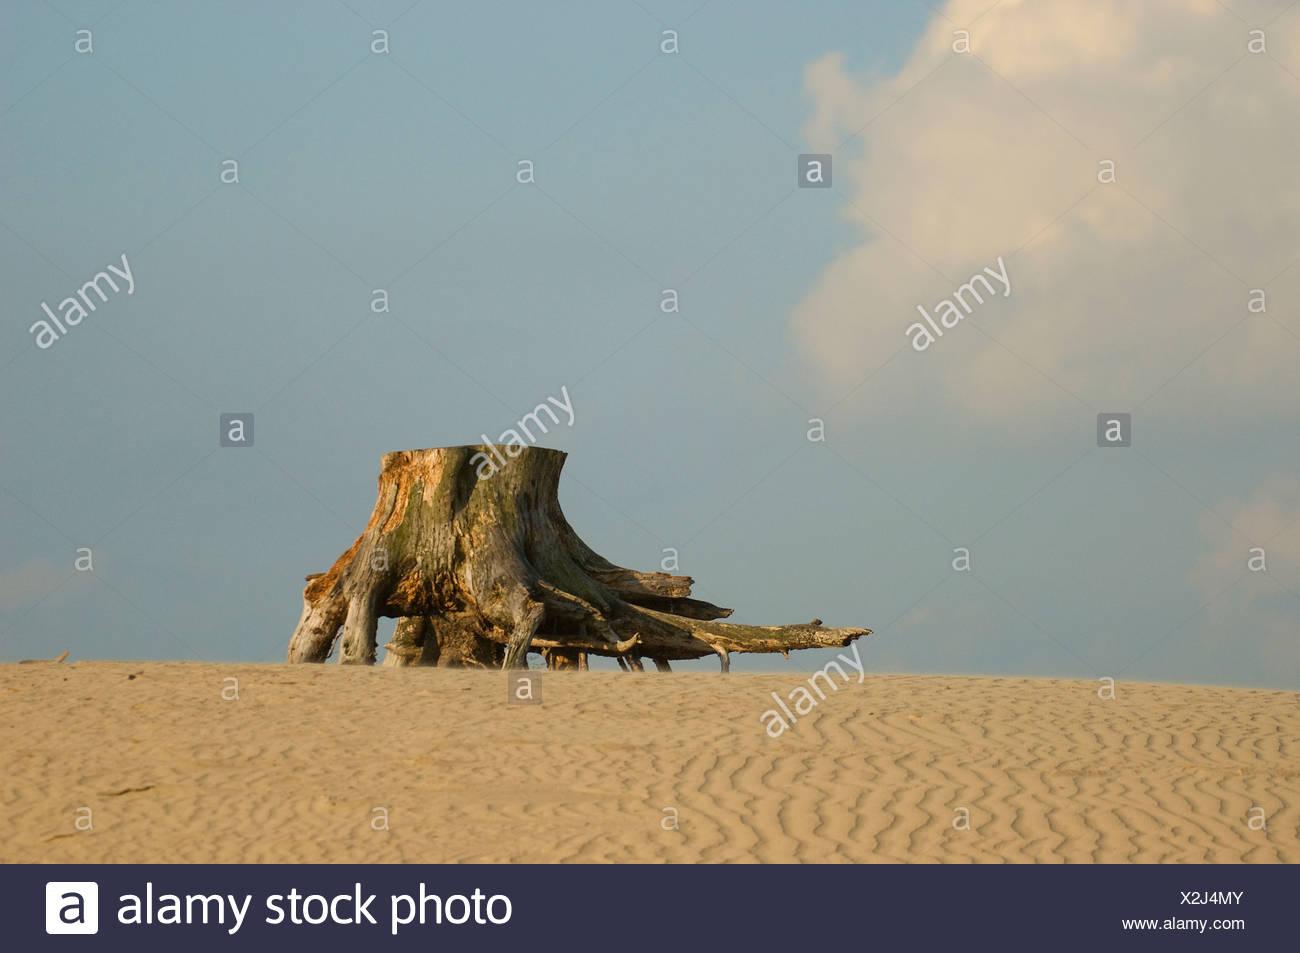 Inland sand dunes - Stock Image